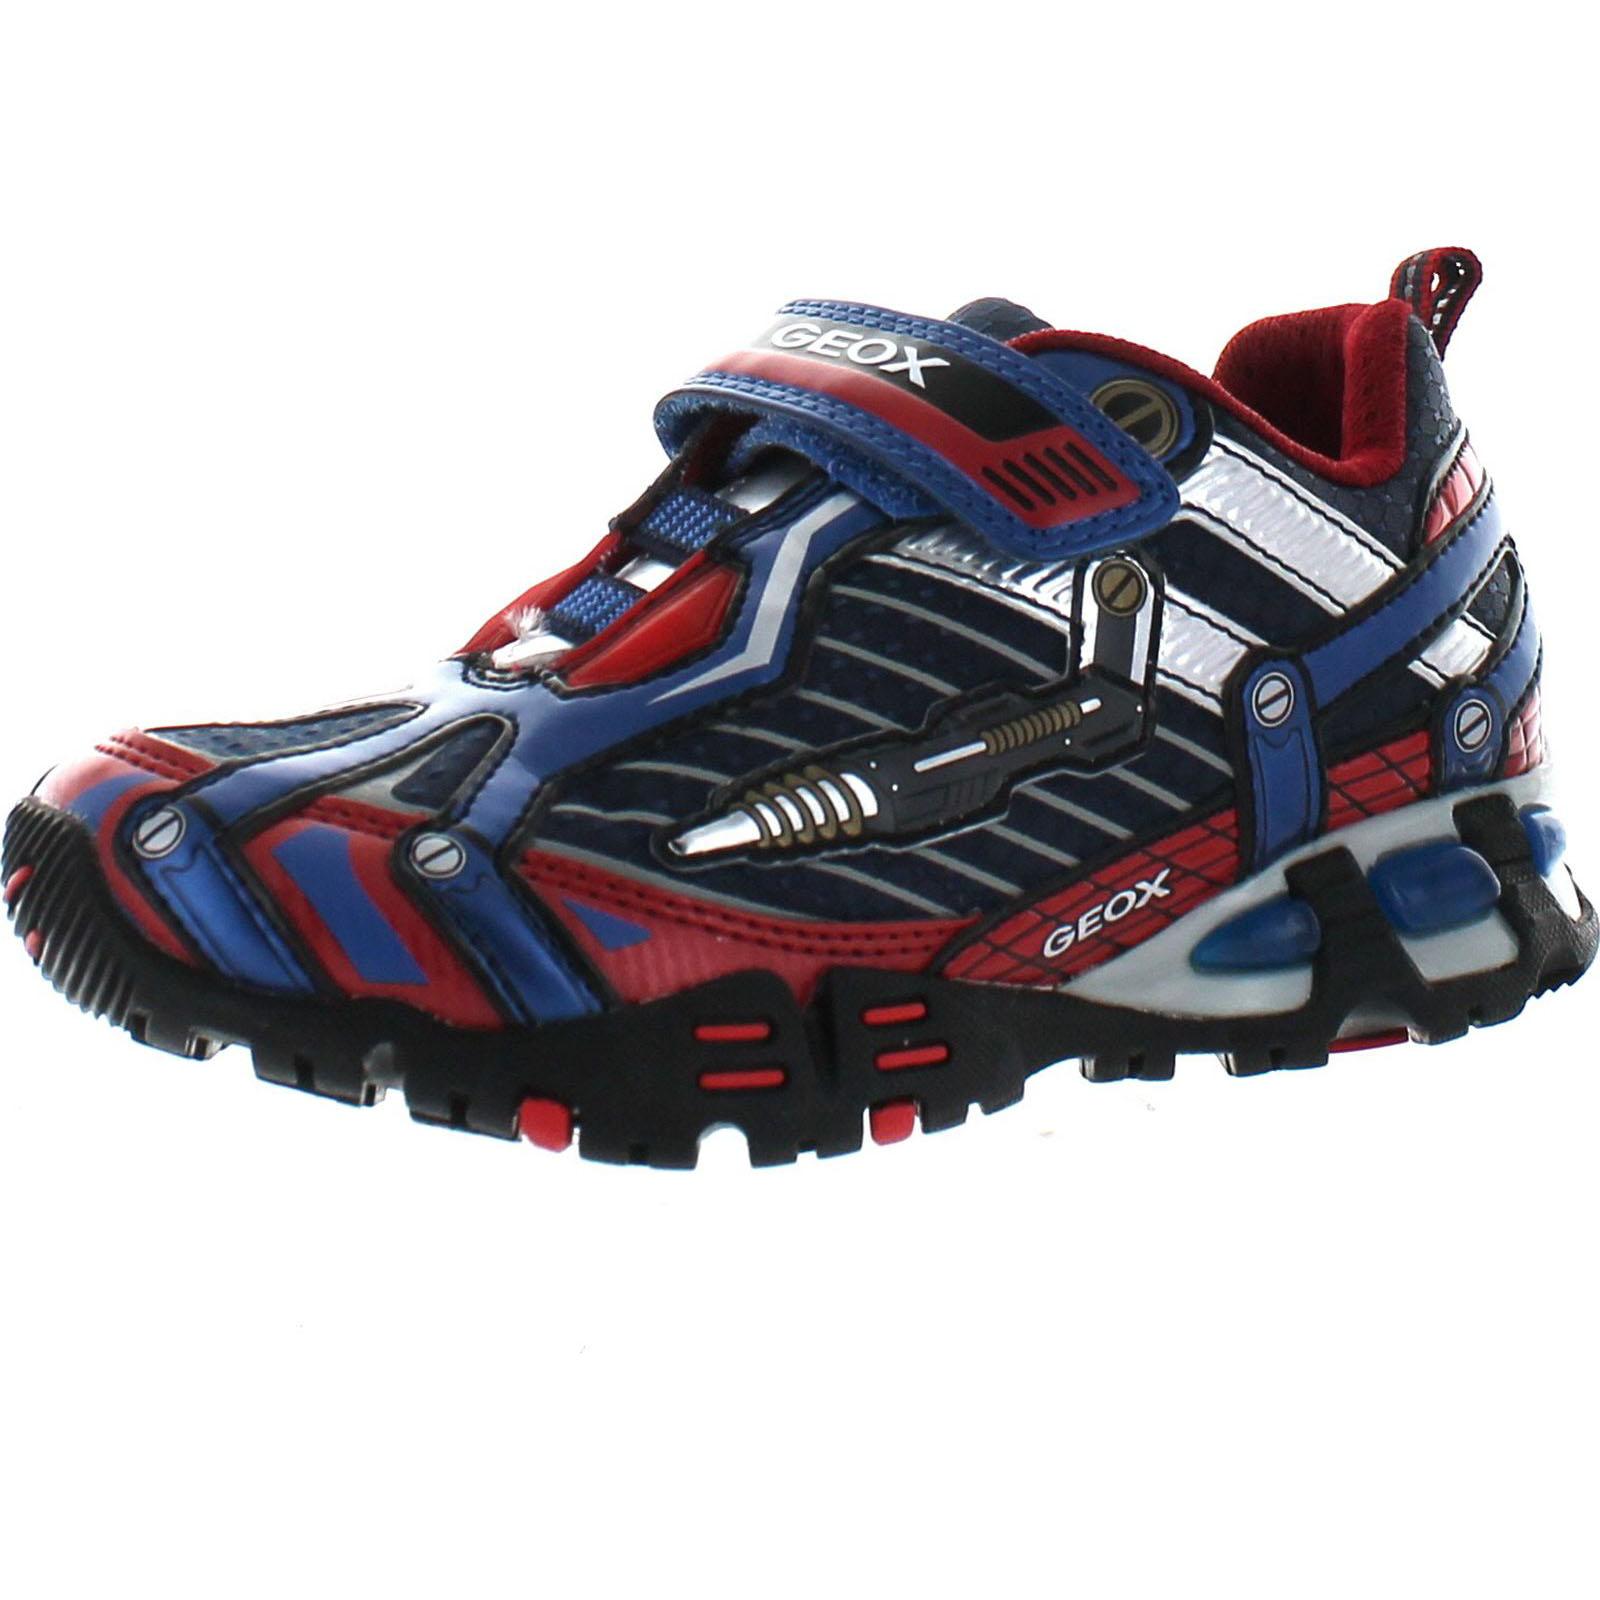 ebaae77bb8 Geox Boys Light Eclipse Fashion Light Up Sneakers | eBay